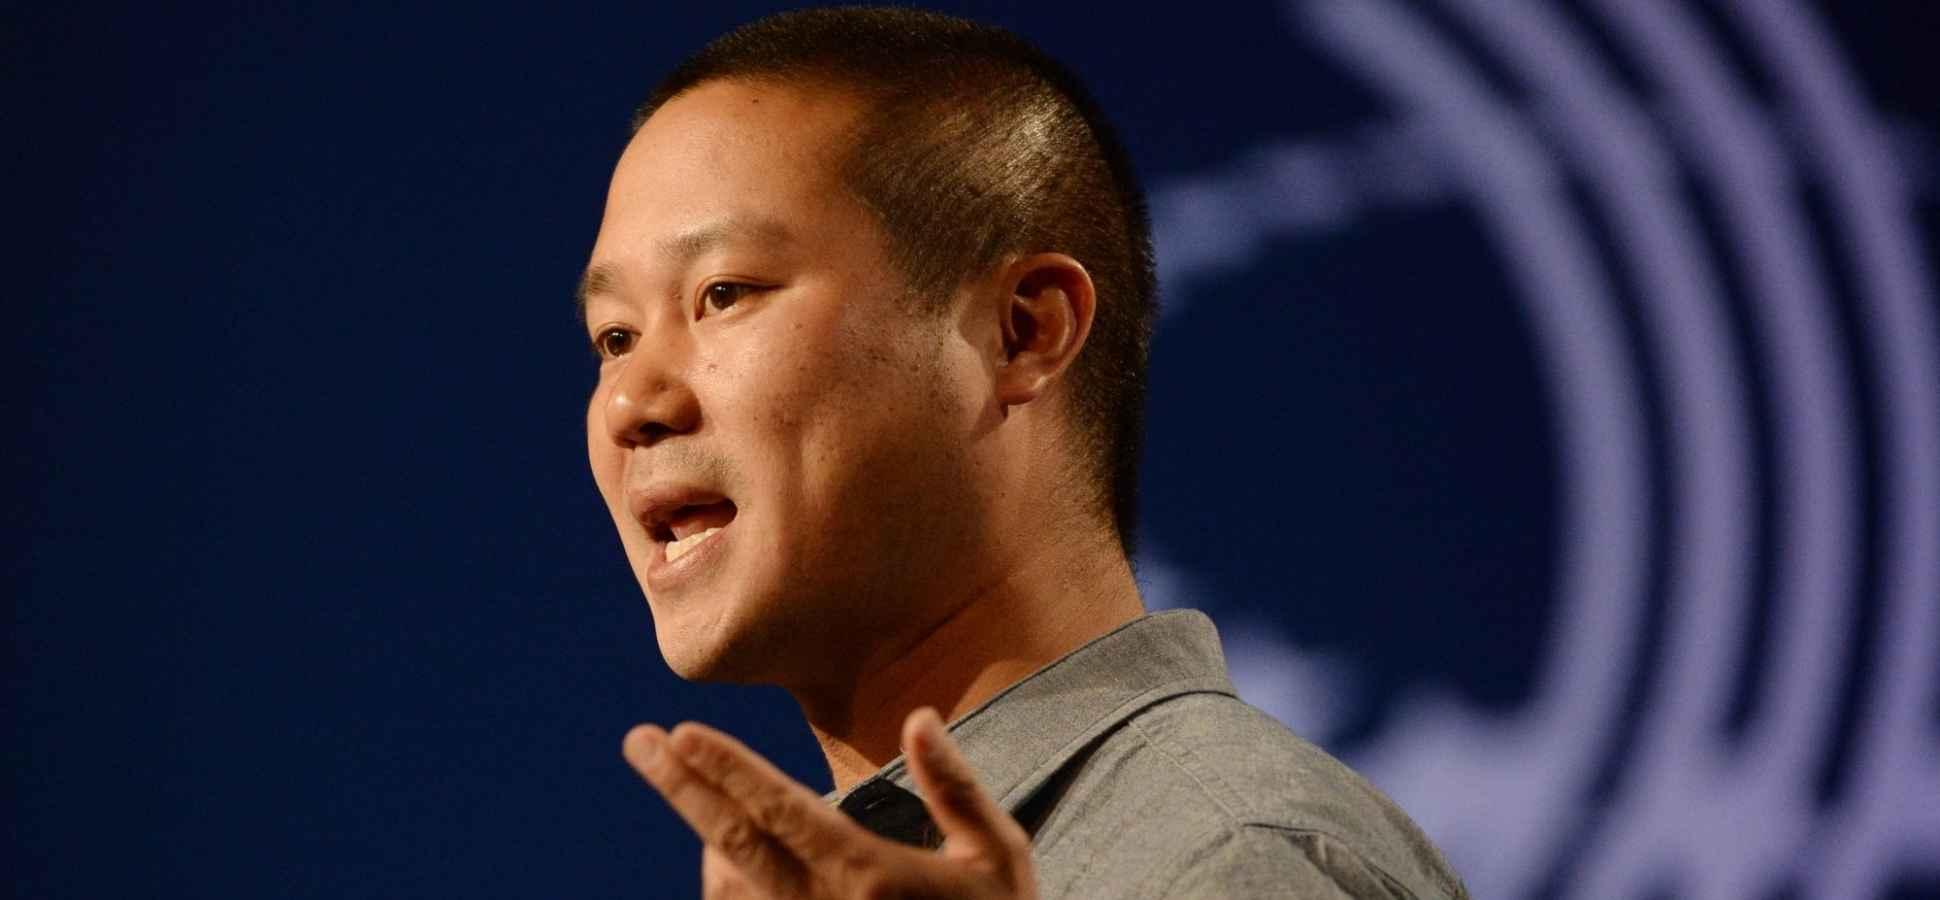 How Tony Hsieh's $350 Million Bet on Las Vegas Went Down